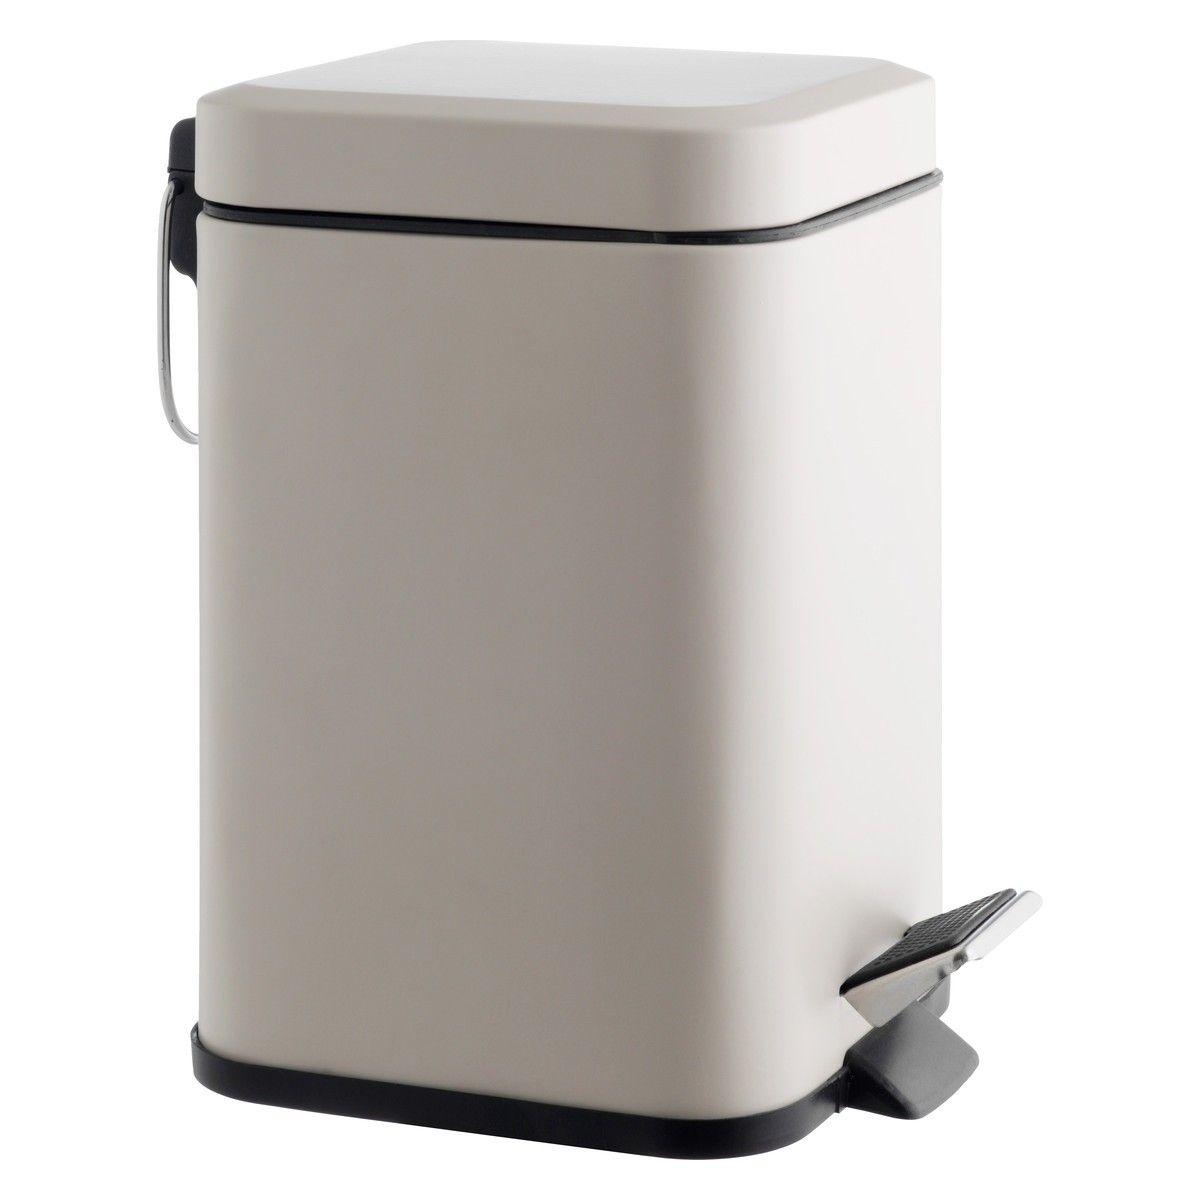 POLI Beige stainless steel bathroom bin Bathroom bin Beige and